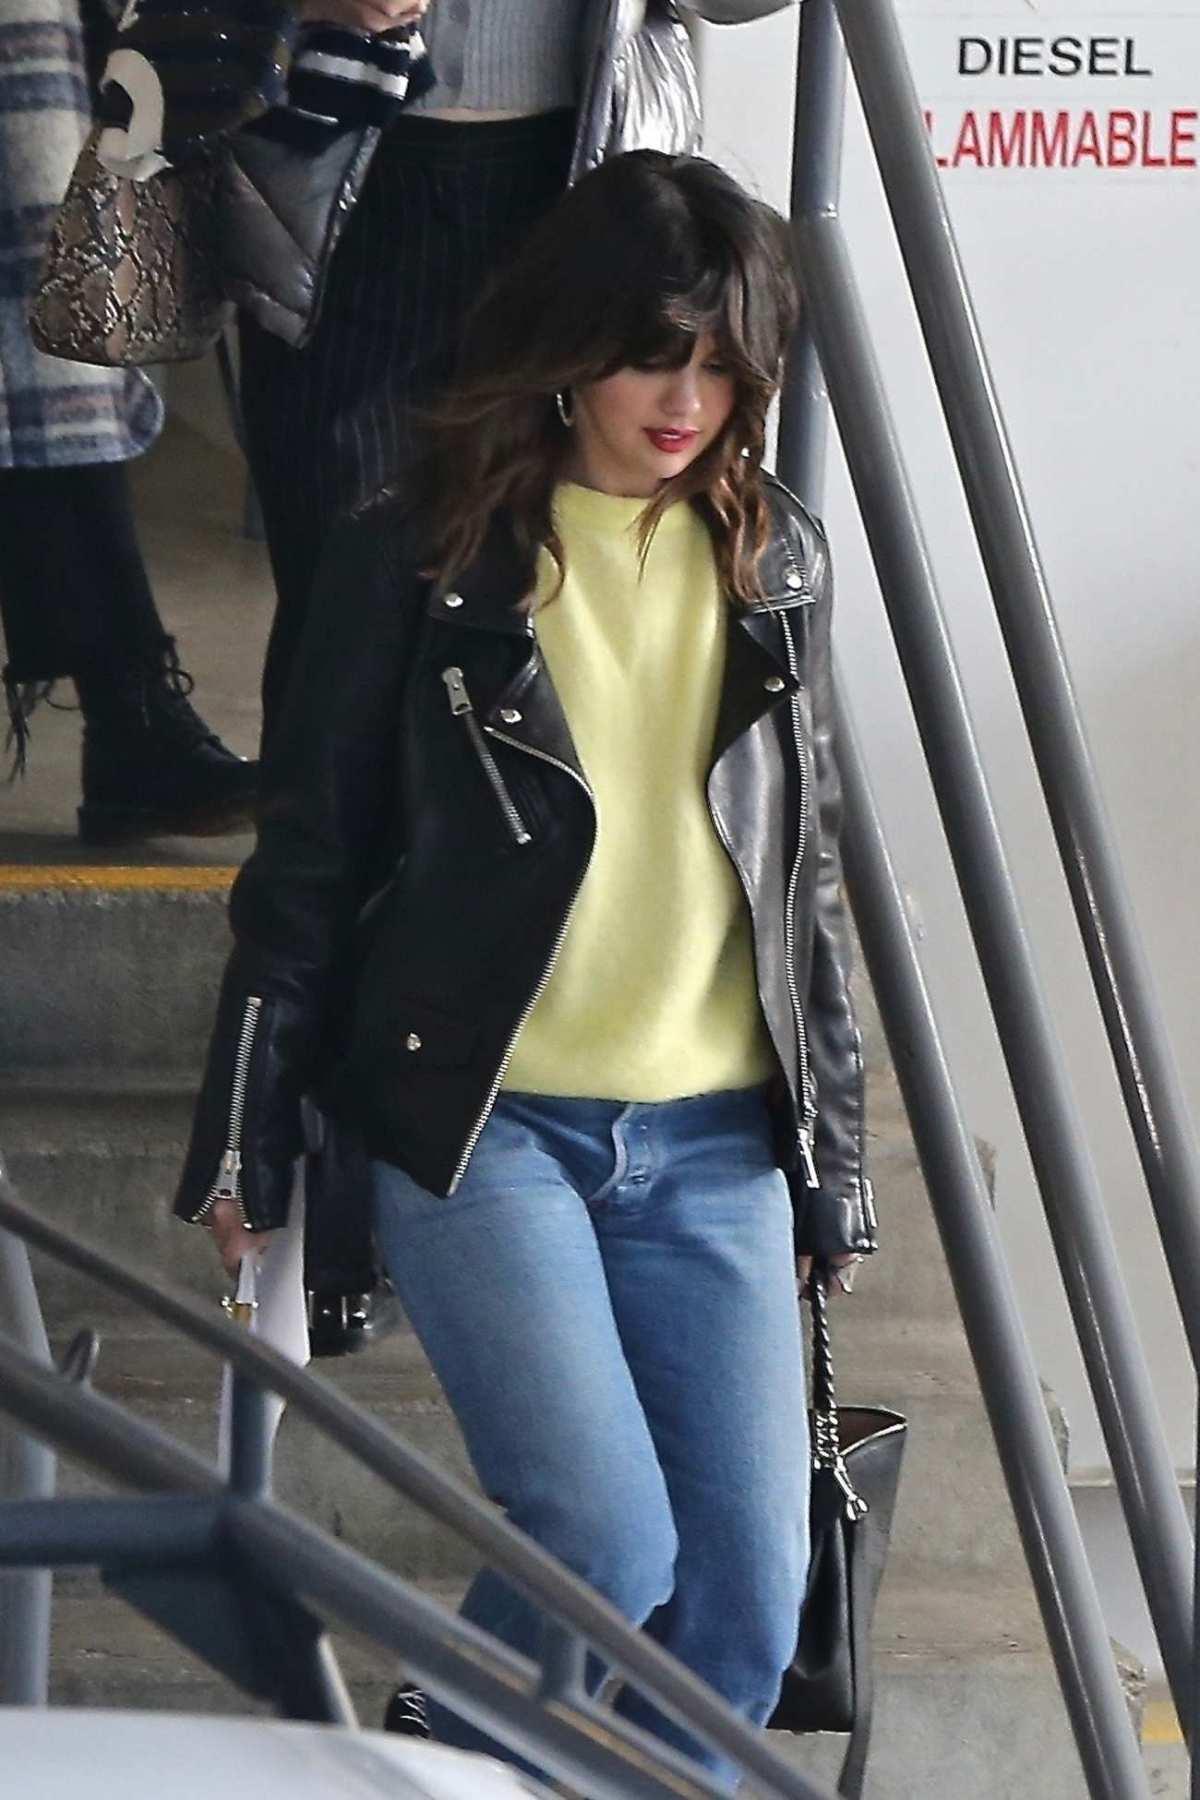 Selena Gomez in Los Angeles, California on Feb 4